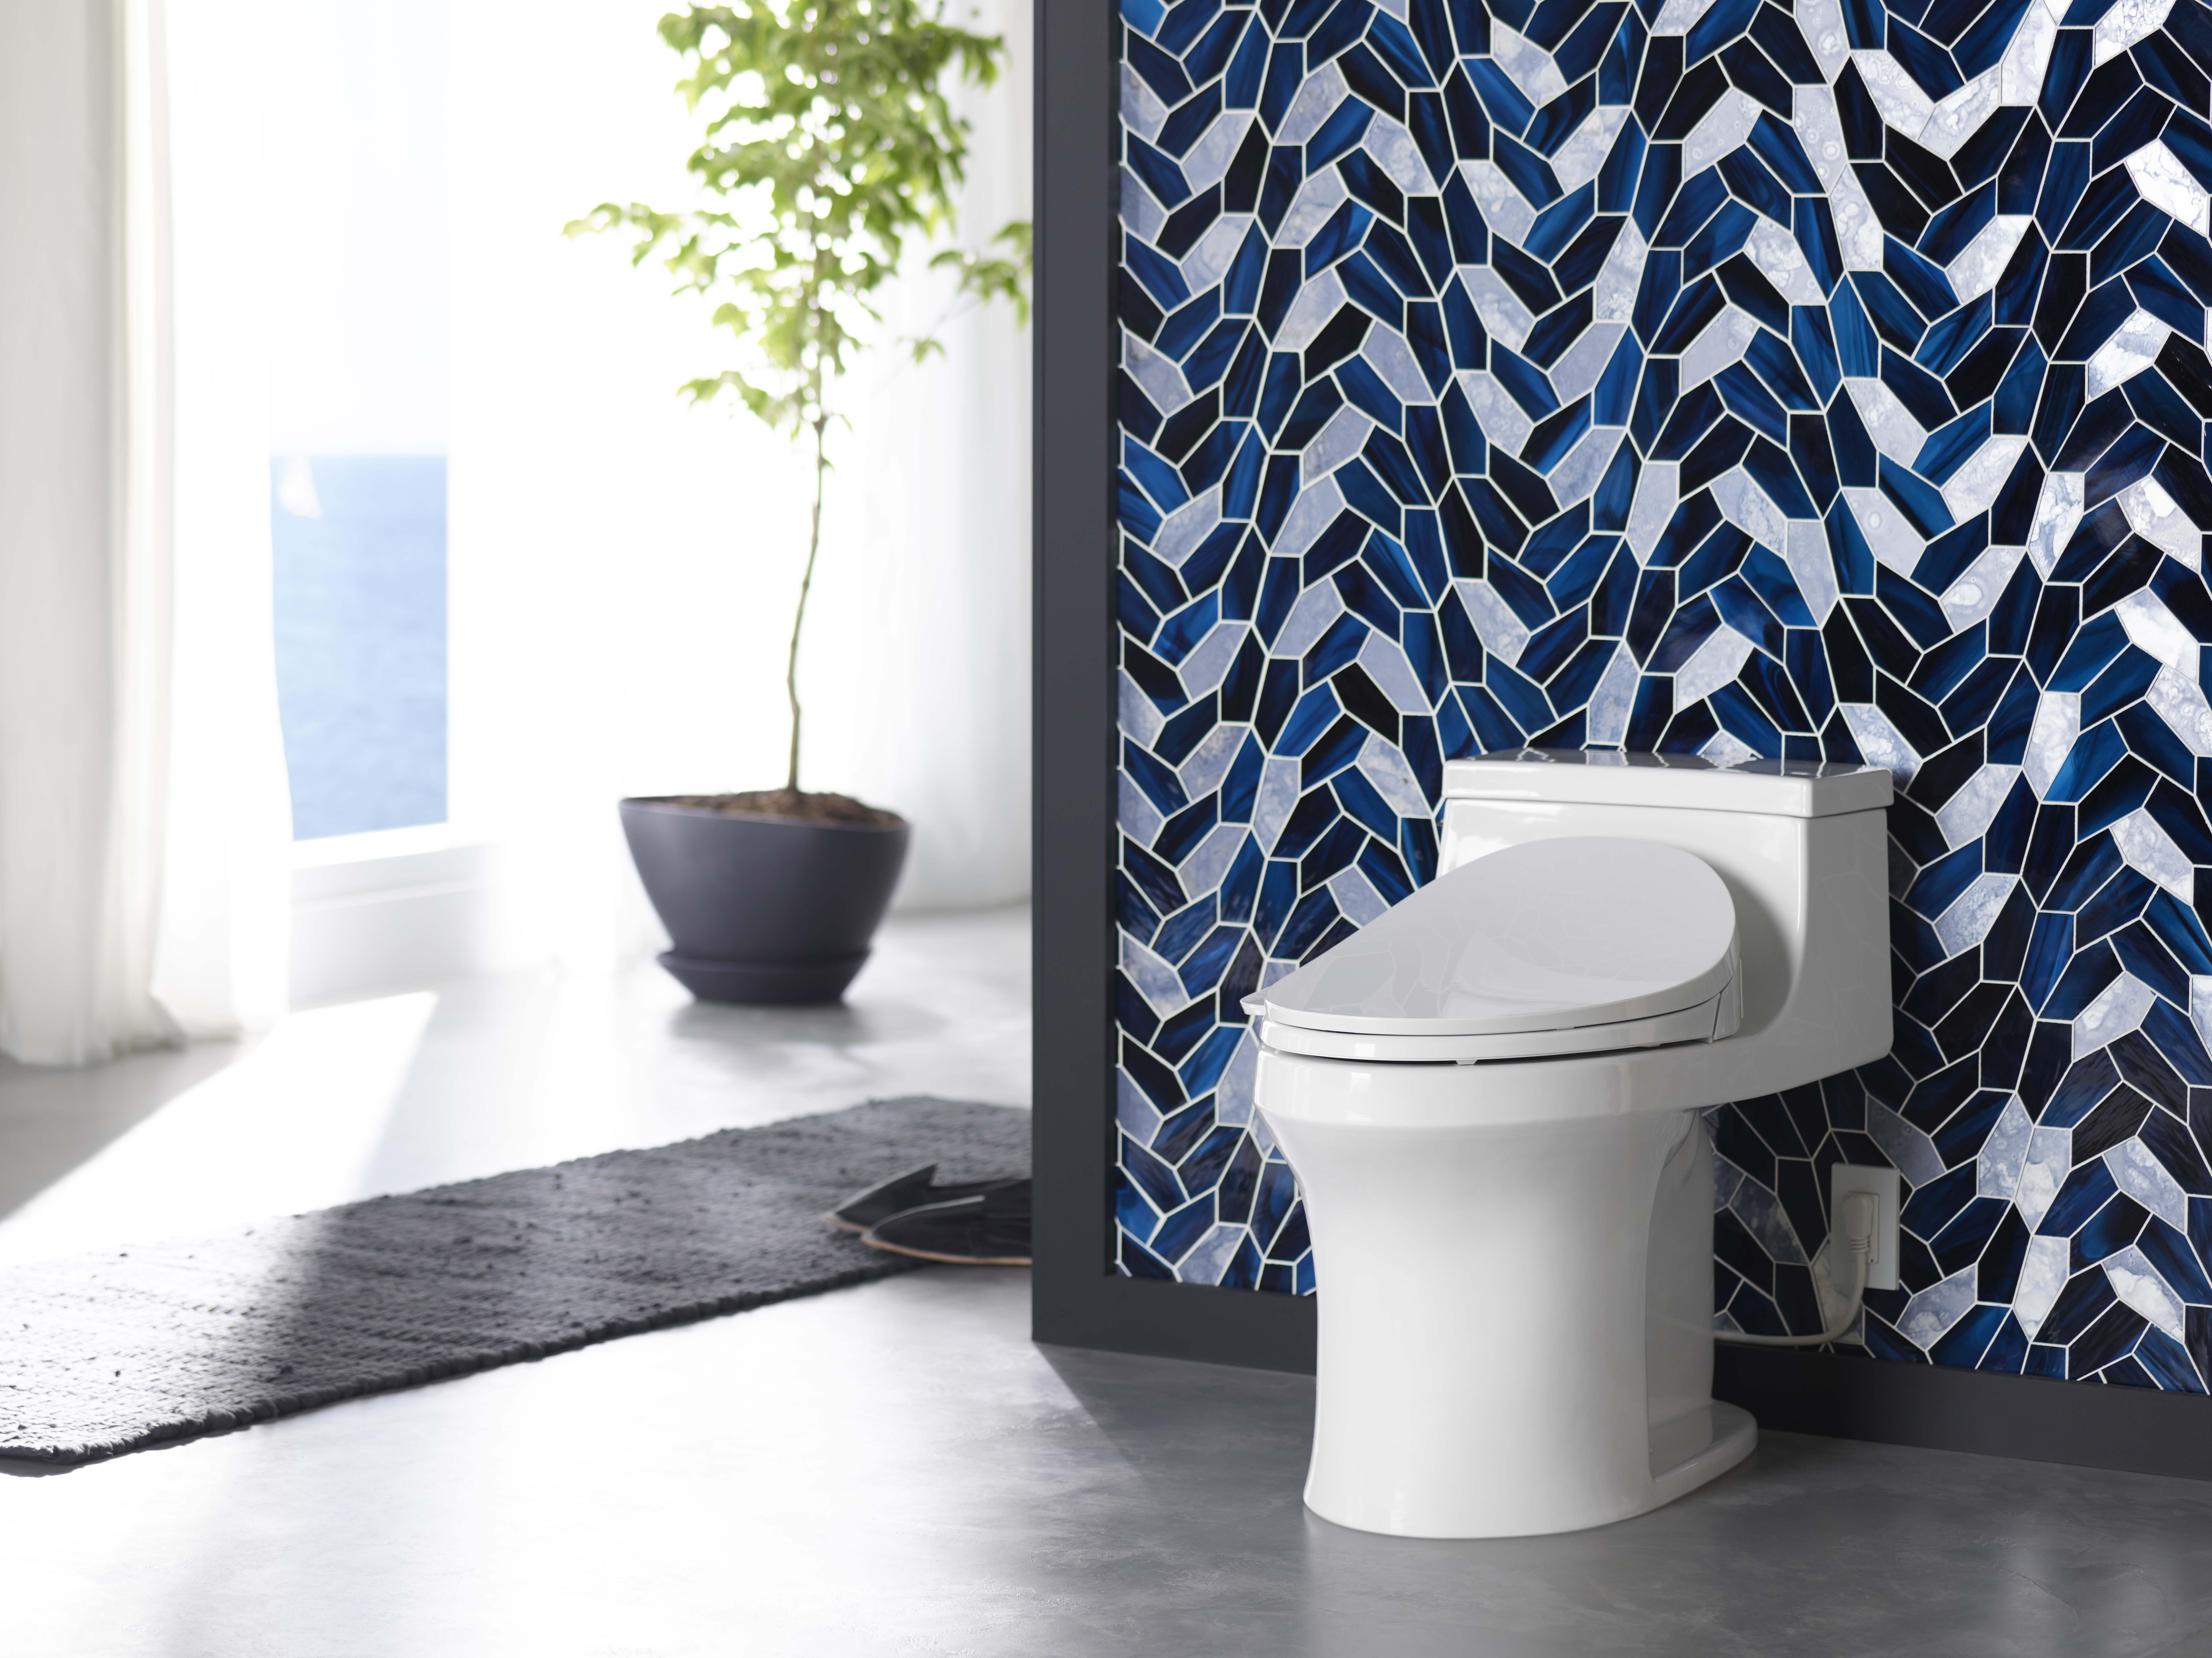 San Souci Toilet     CS-230 Cleansing Toilet Seat     ANN SACKS® Chrysalis Mosaics Tile     The artful detail of a reflective glass backdrop accentuates the simplicity of this one-piece toilet design.